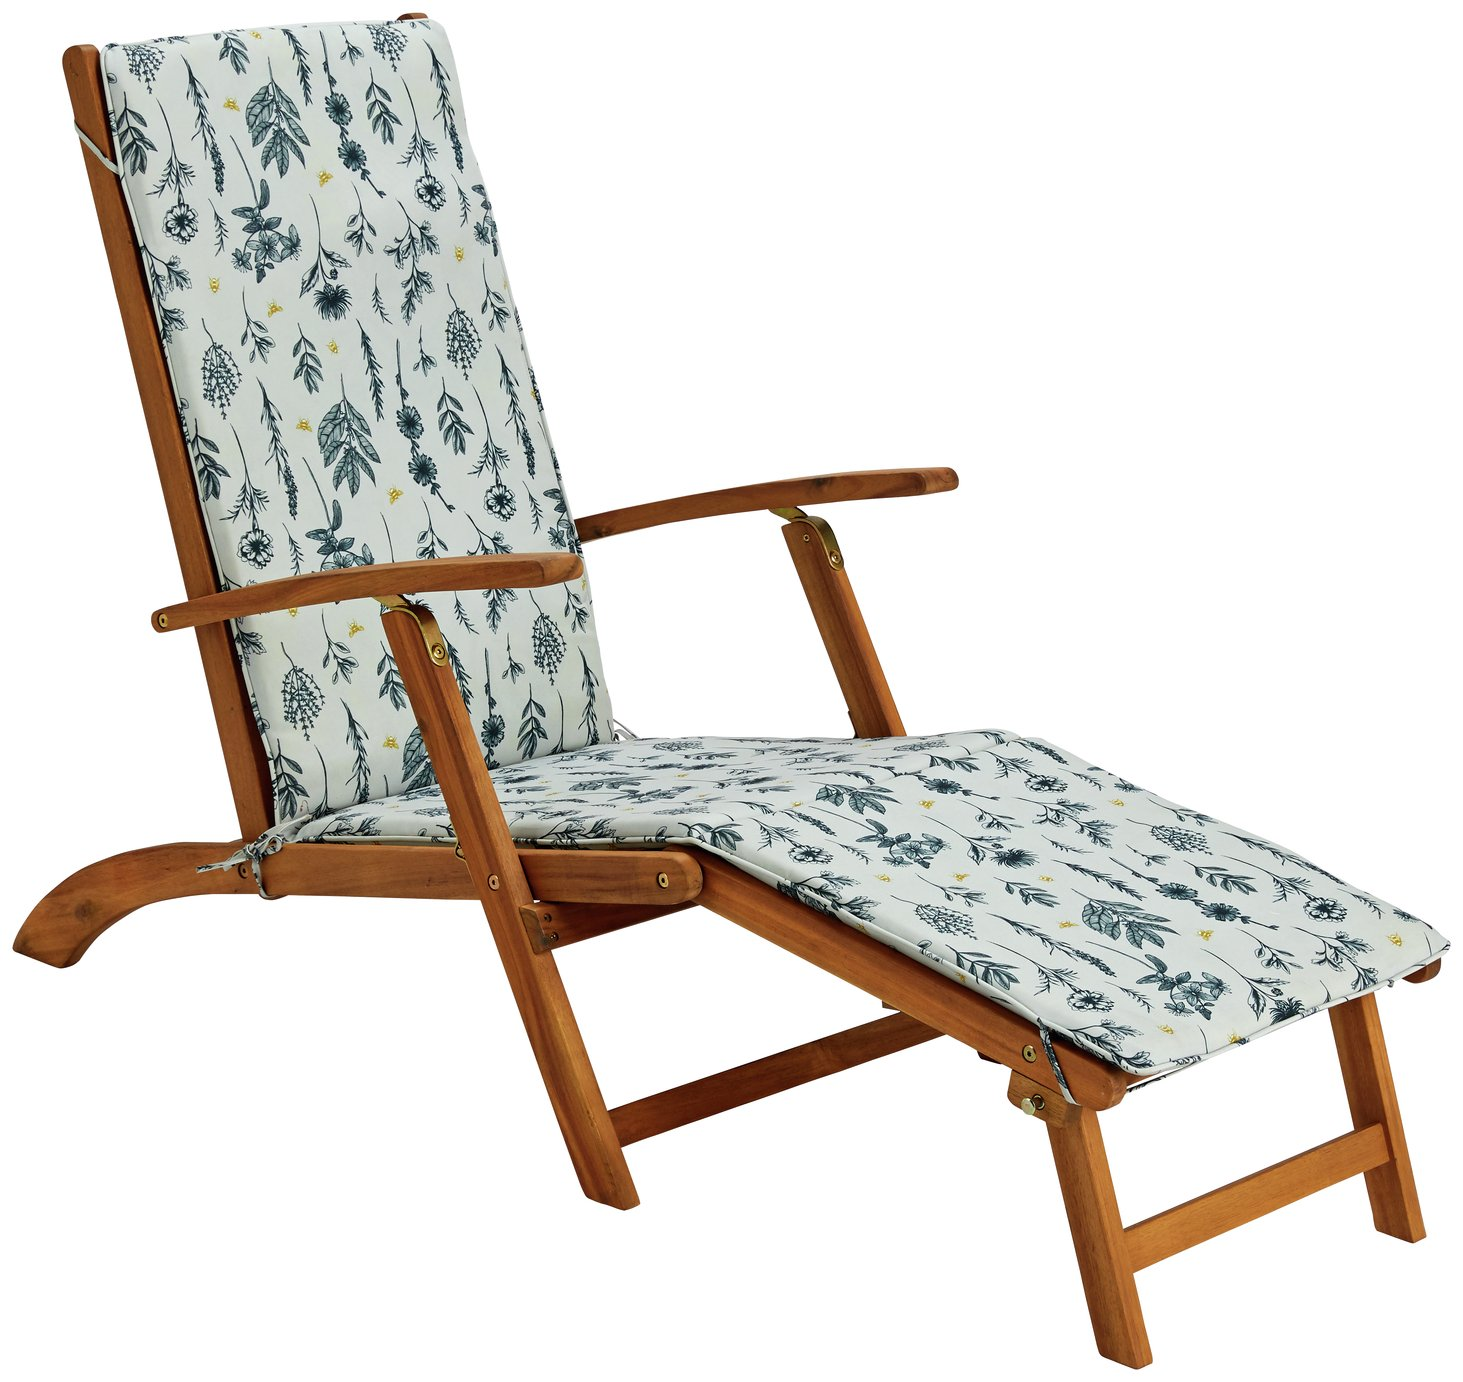 Argos Home Wooden Steamer Chair with Botanic Cushion